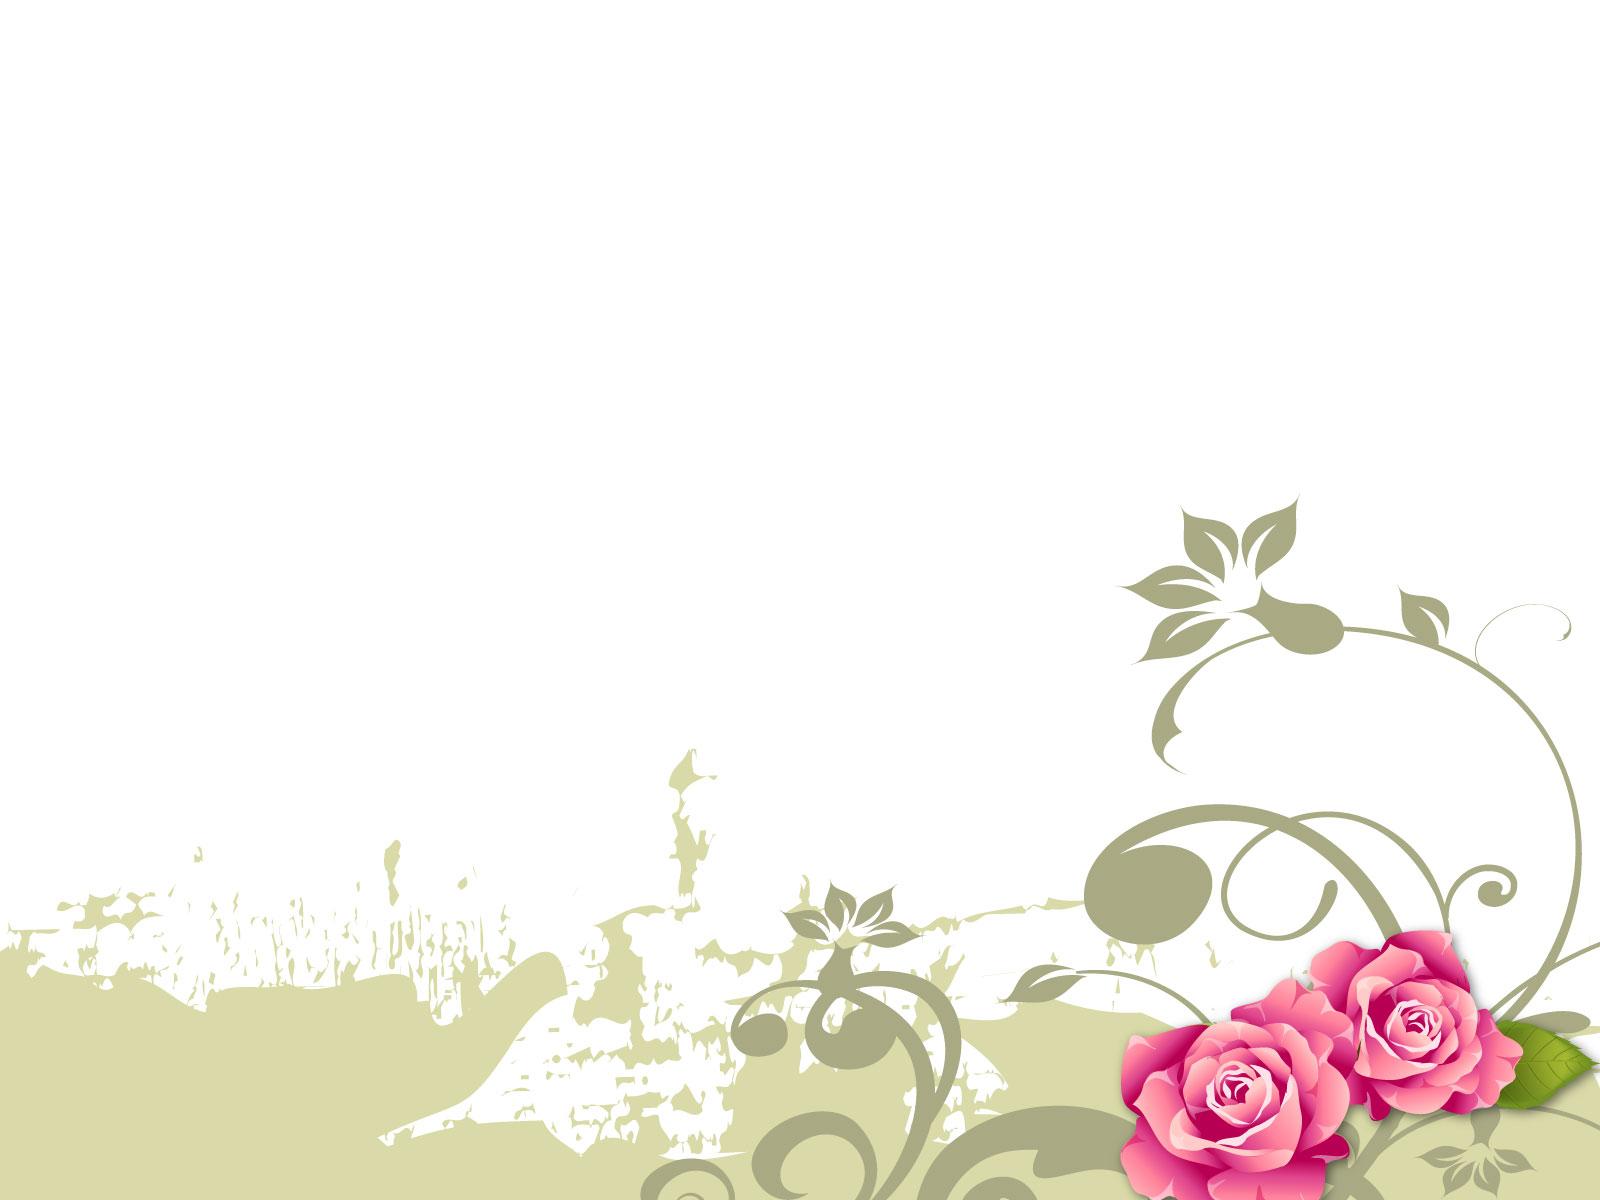 Hình nền Powerpoint hoa đẹp nhất